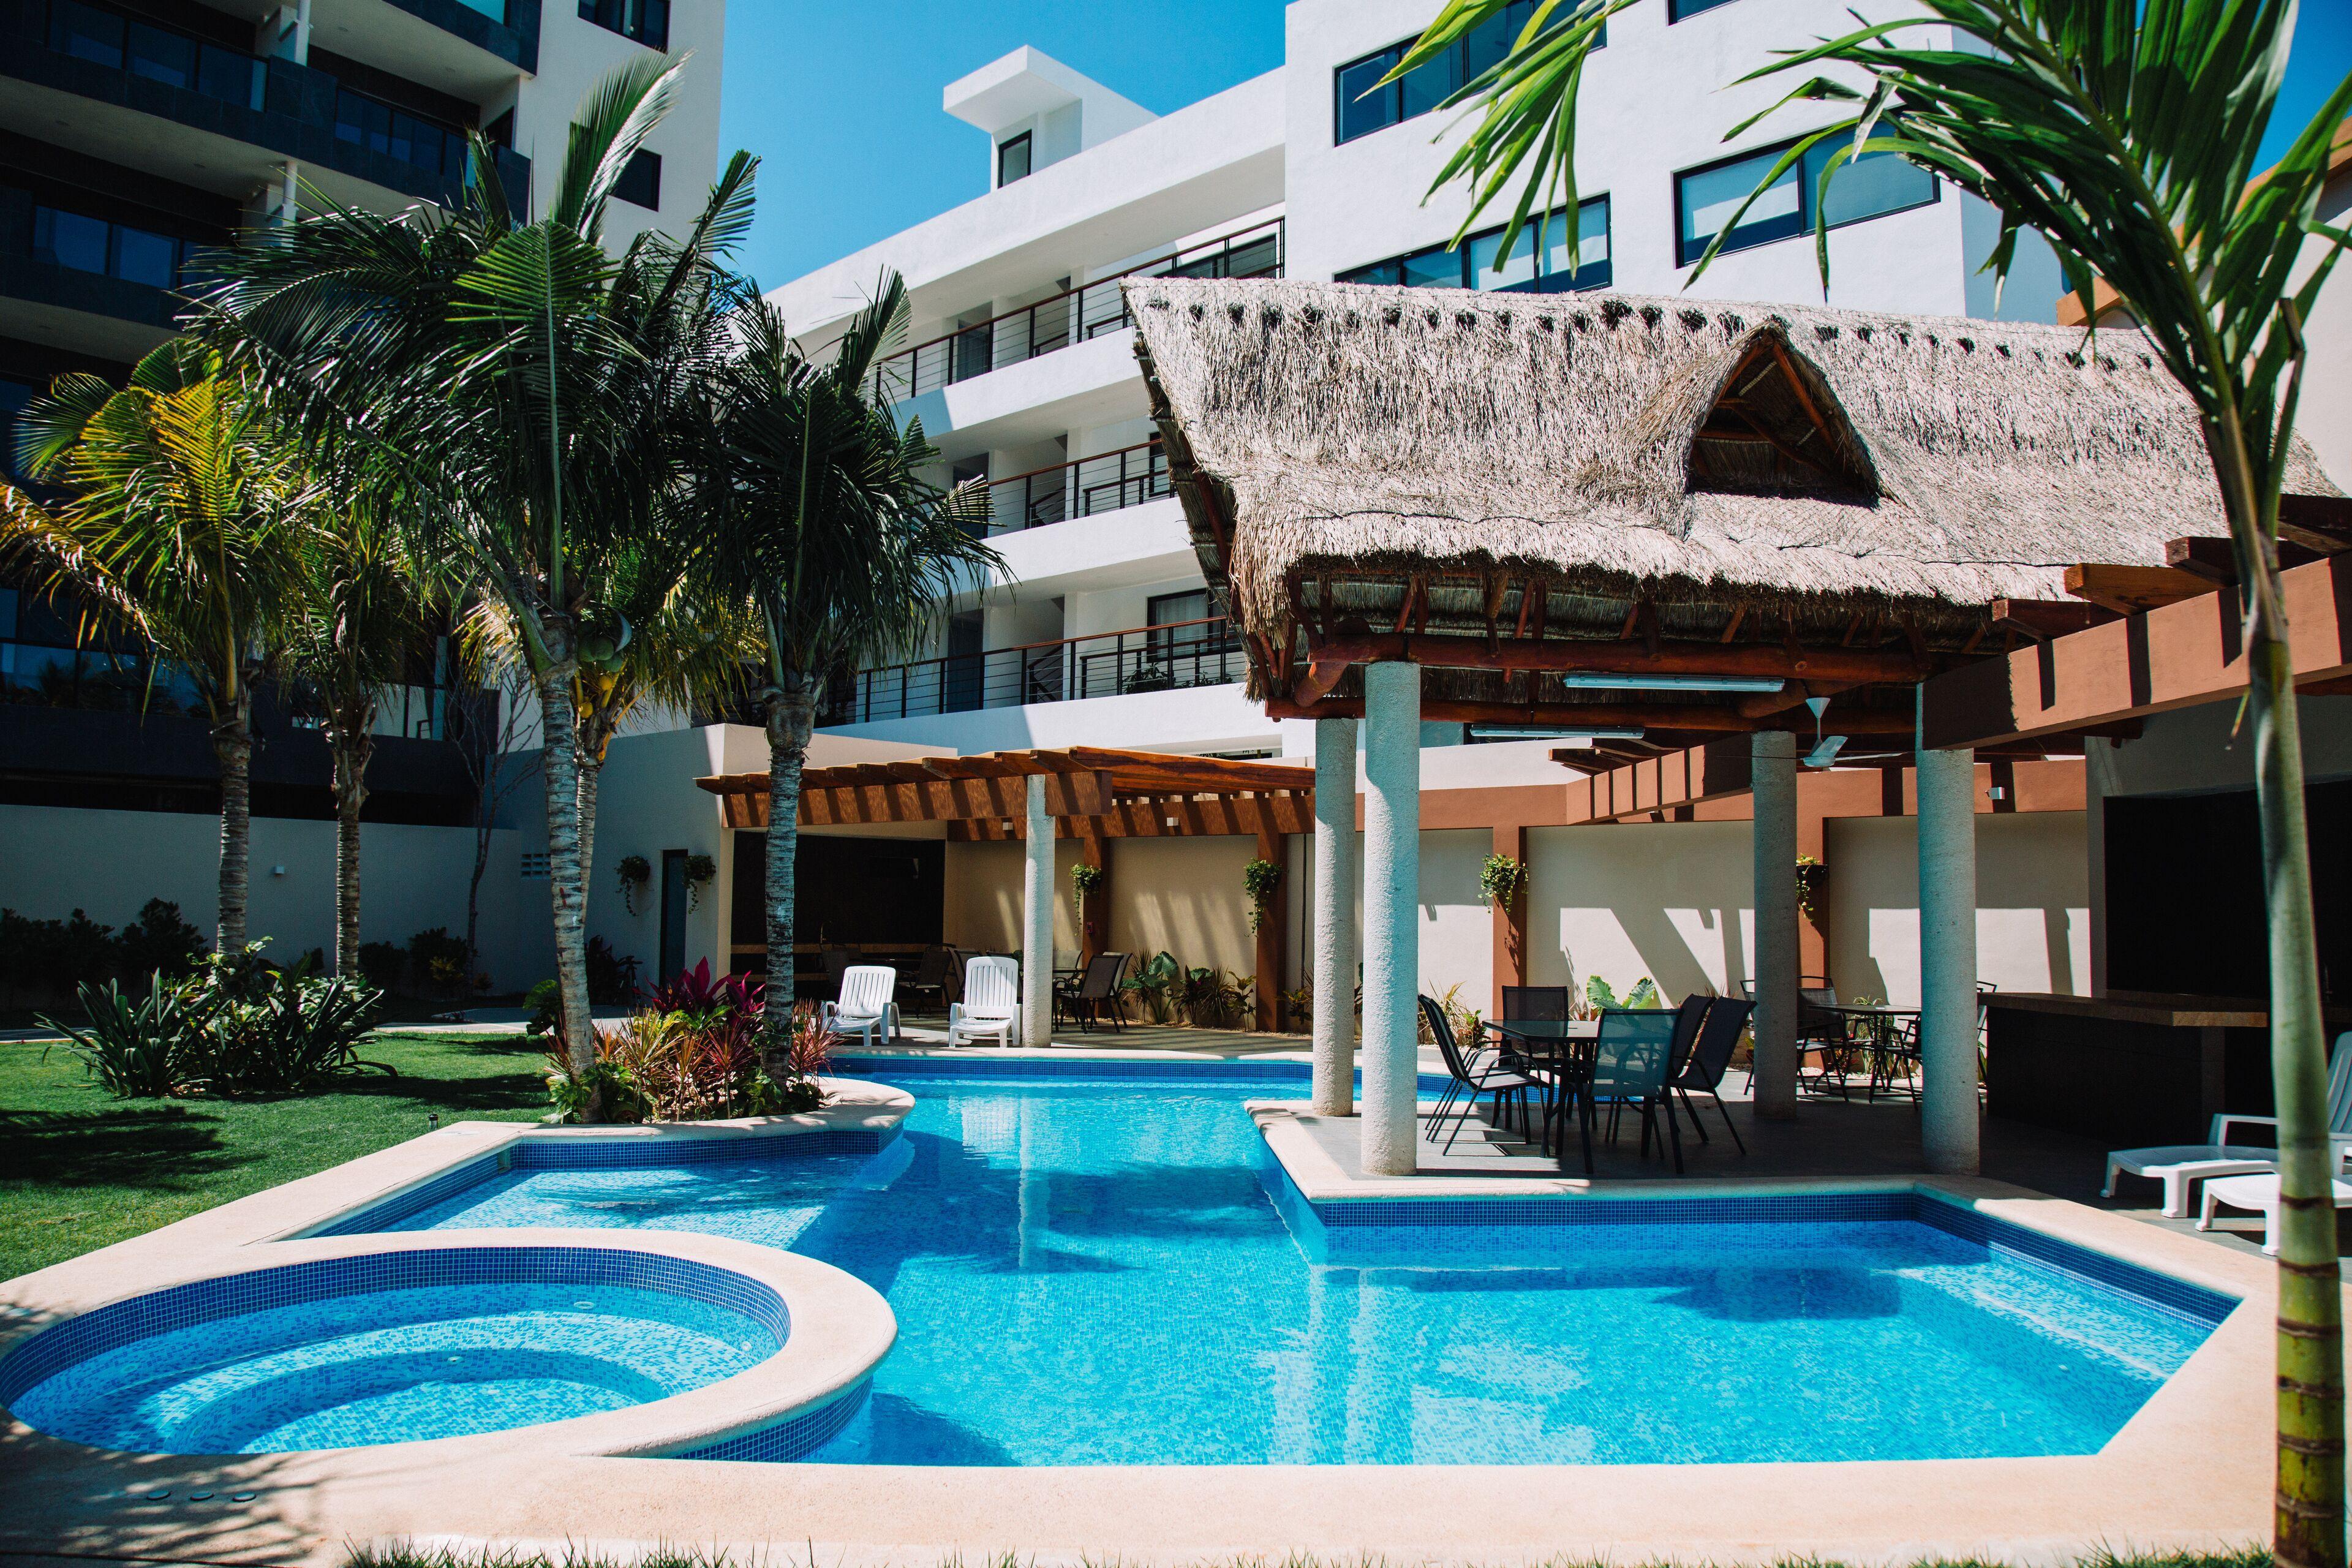 Courtesy of Tres Soles Apartments / Expedia